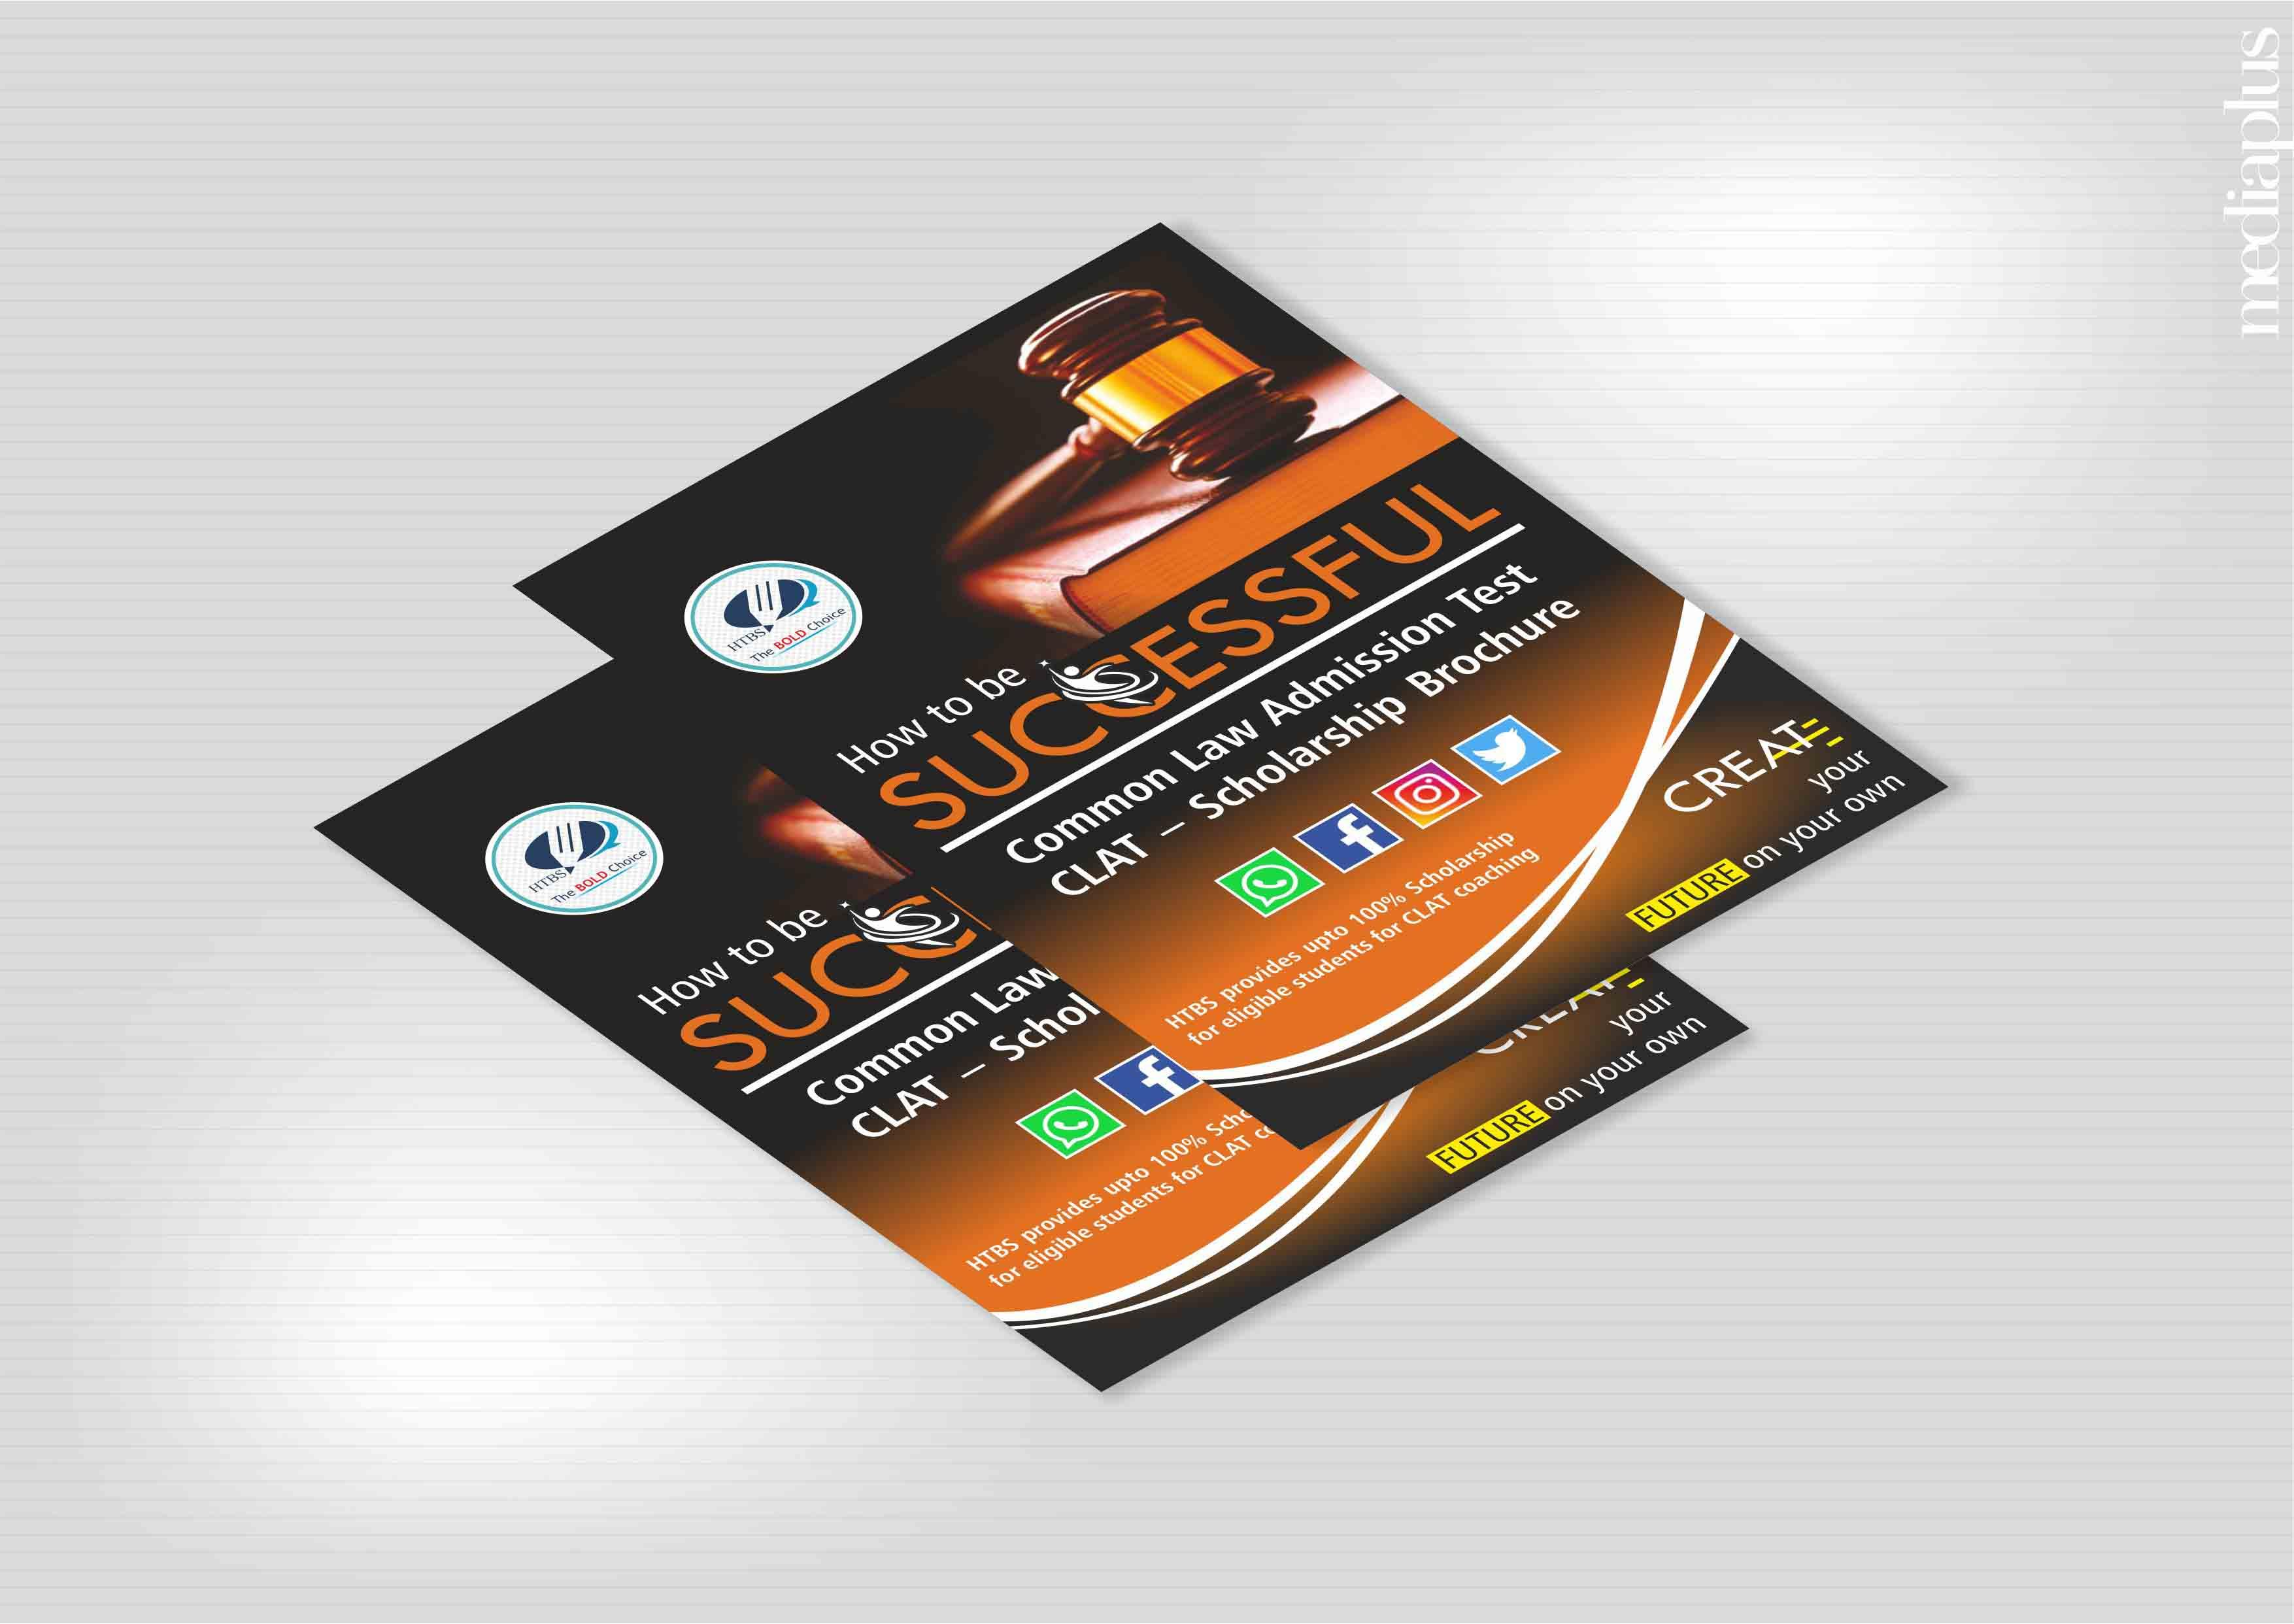 Flyer Design Print Advertising by Media Plus in Hyderabad